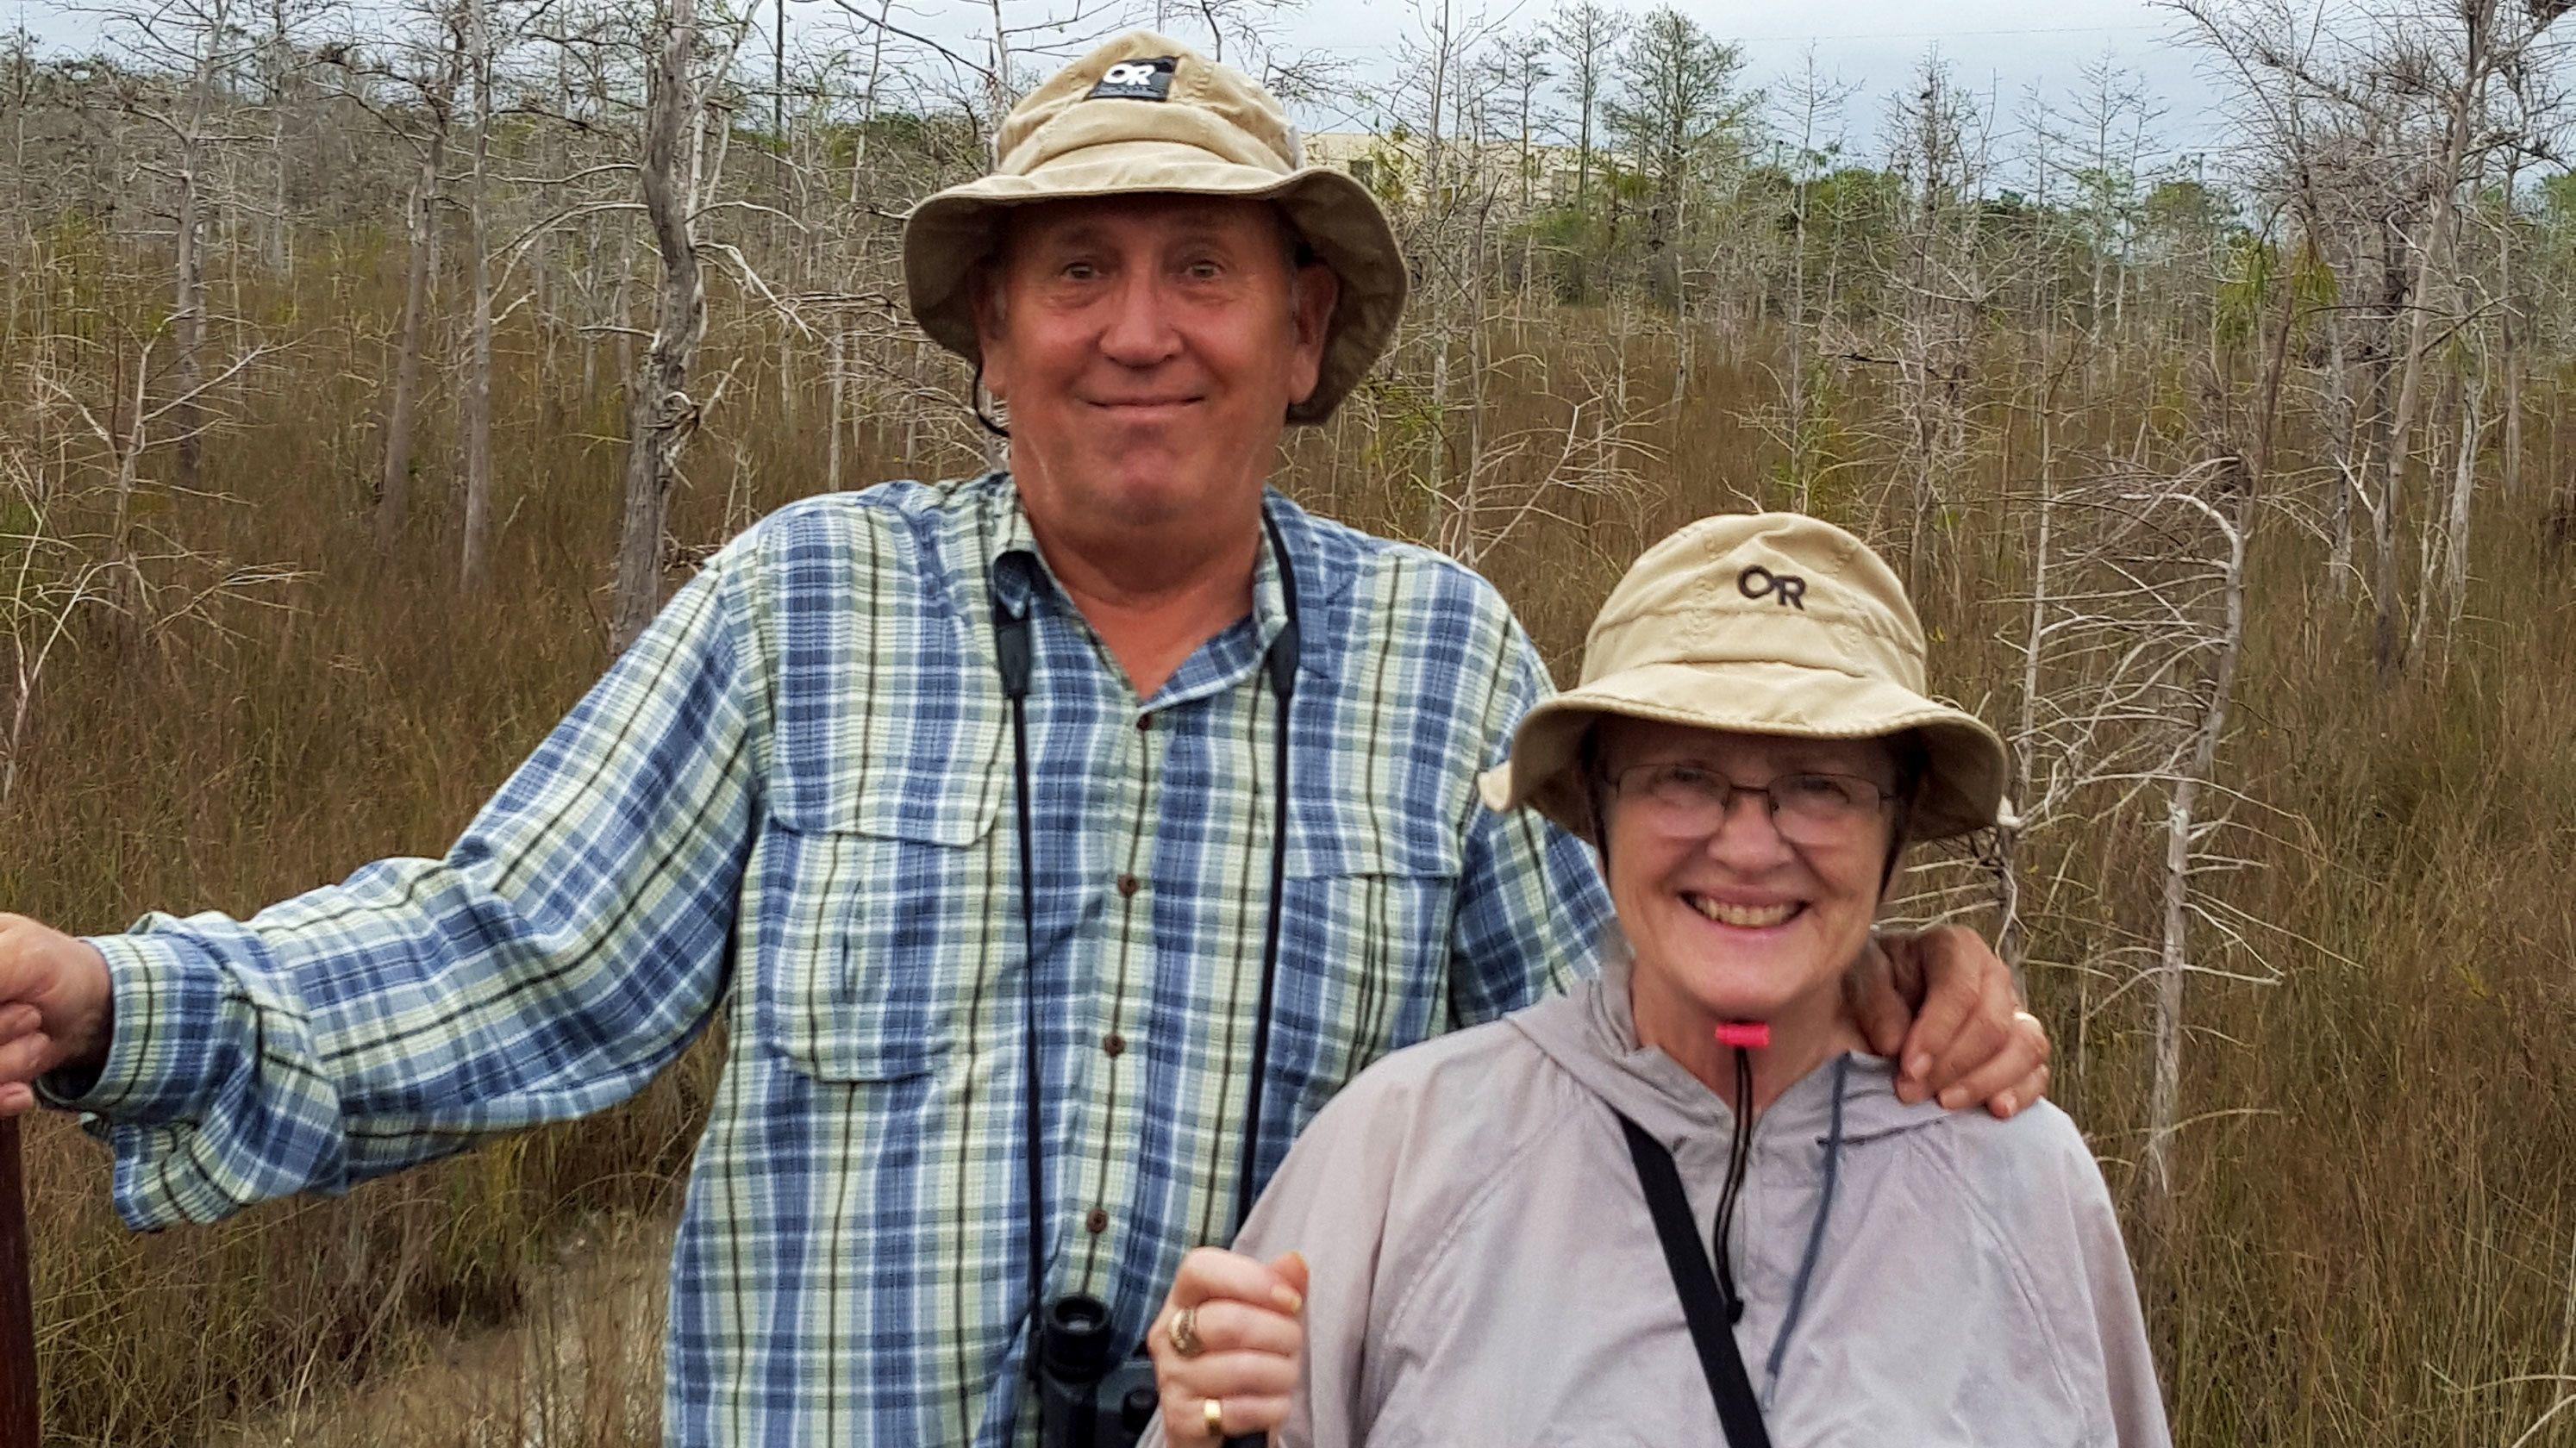 Couple posing for photo while walking through Everglades